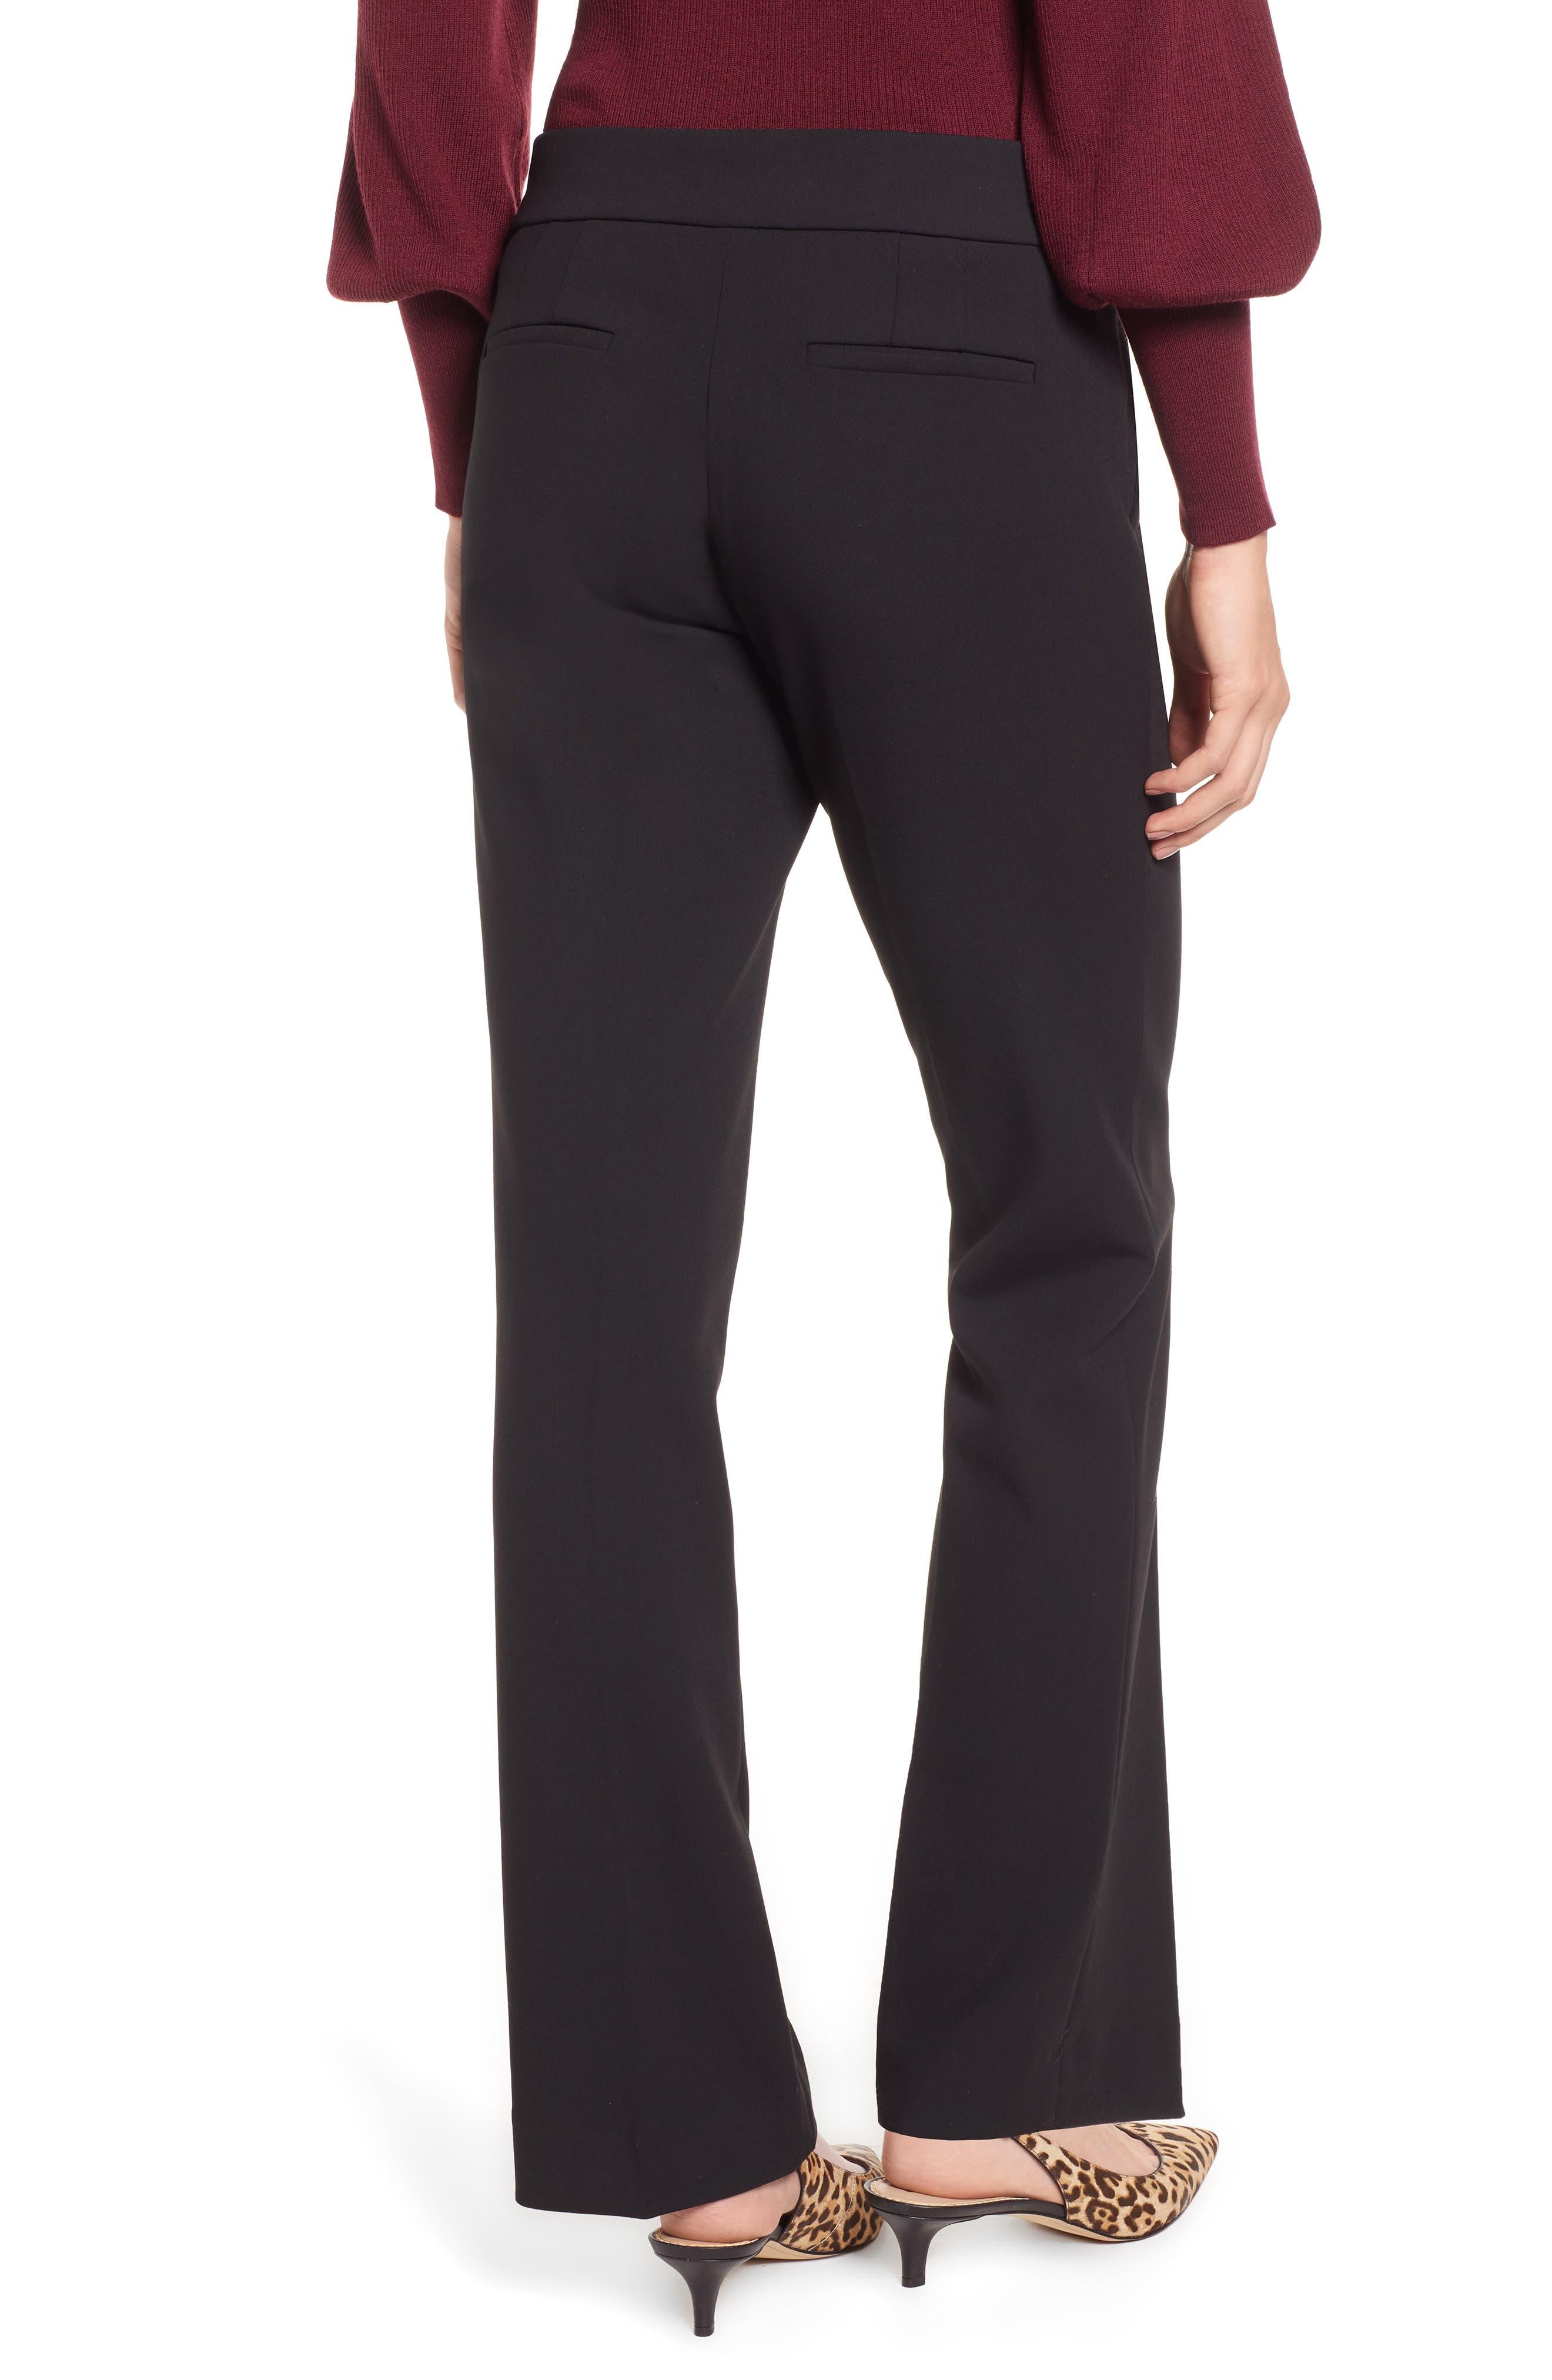 Edie Full Length Trouser in Four-Season Stretch,                             Alternate thumbnail 2, color,                             001